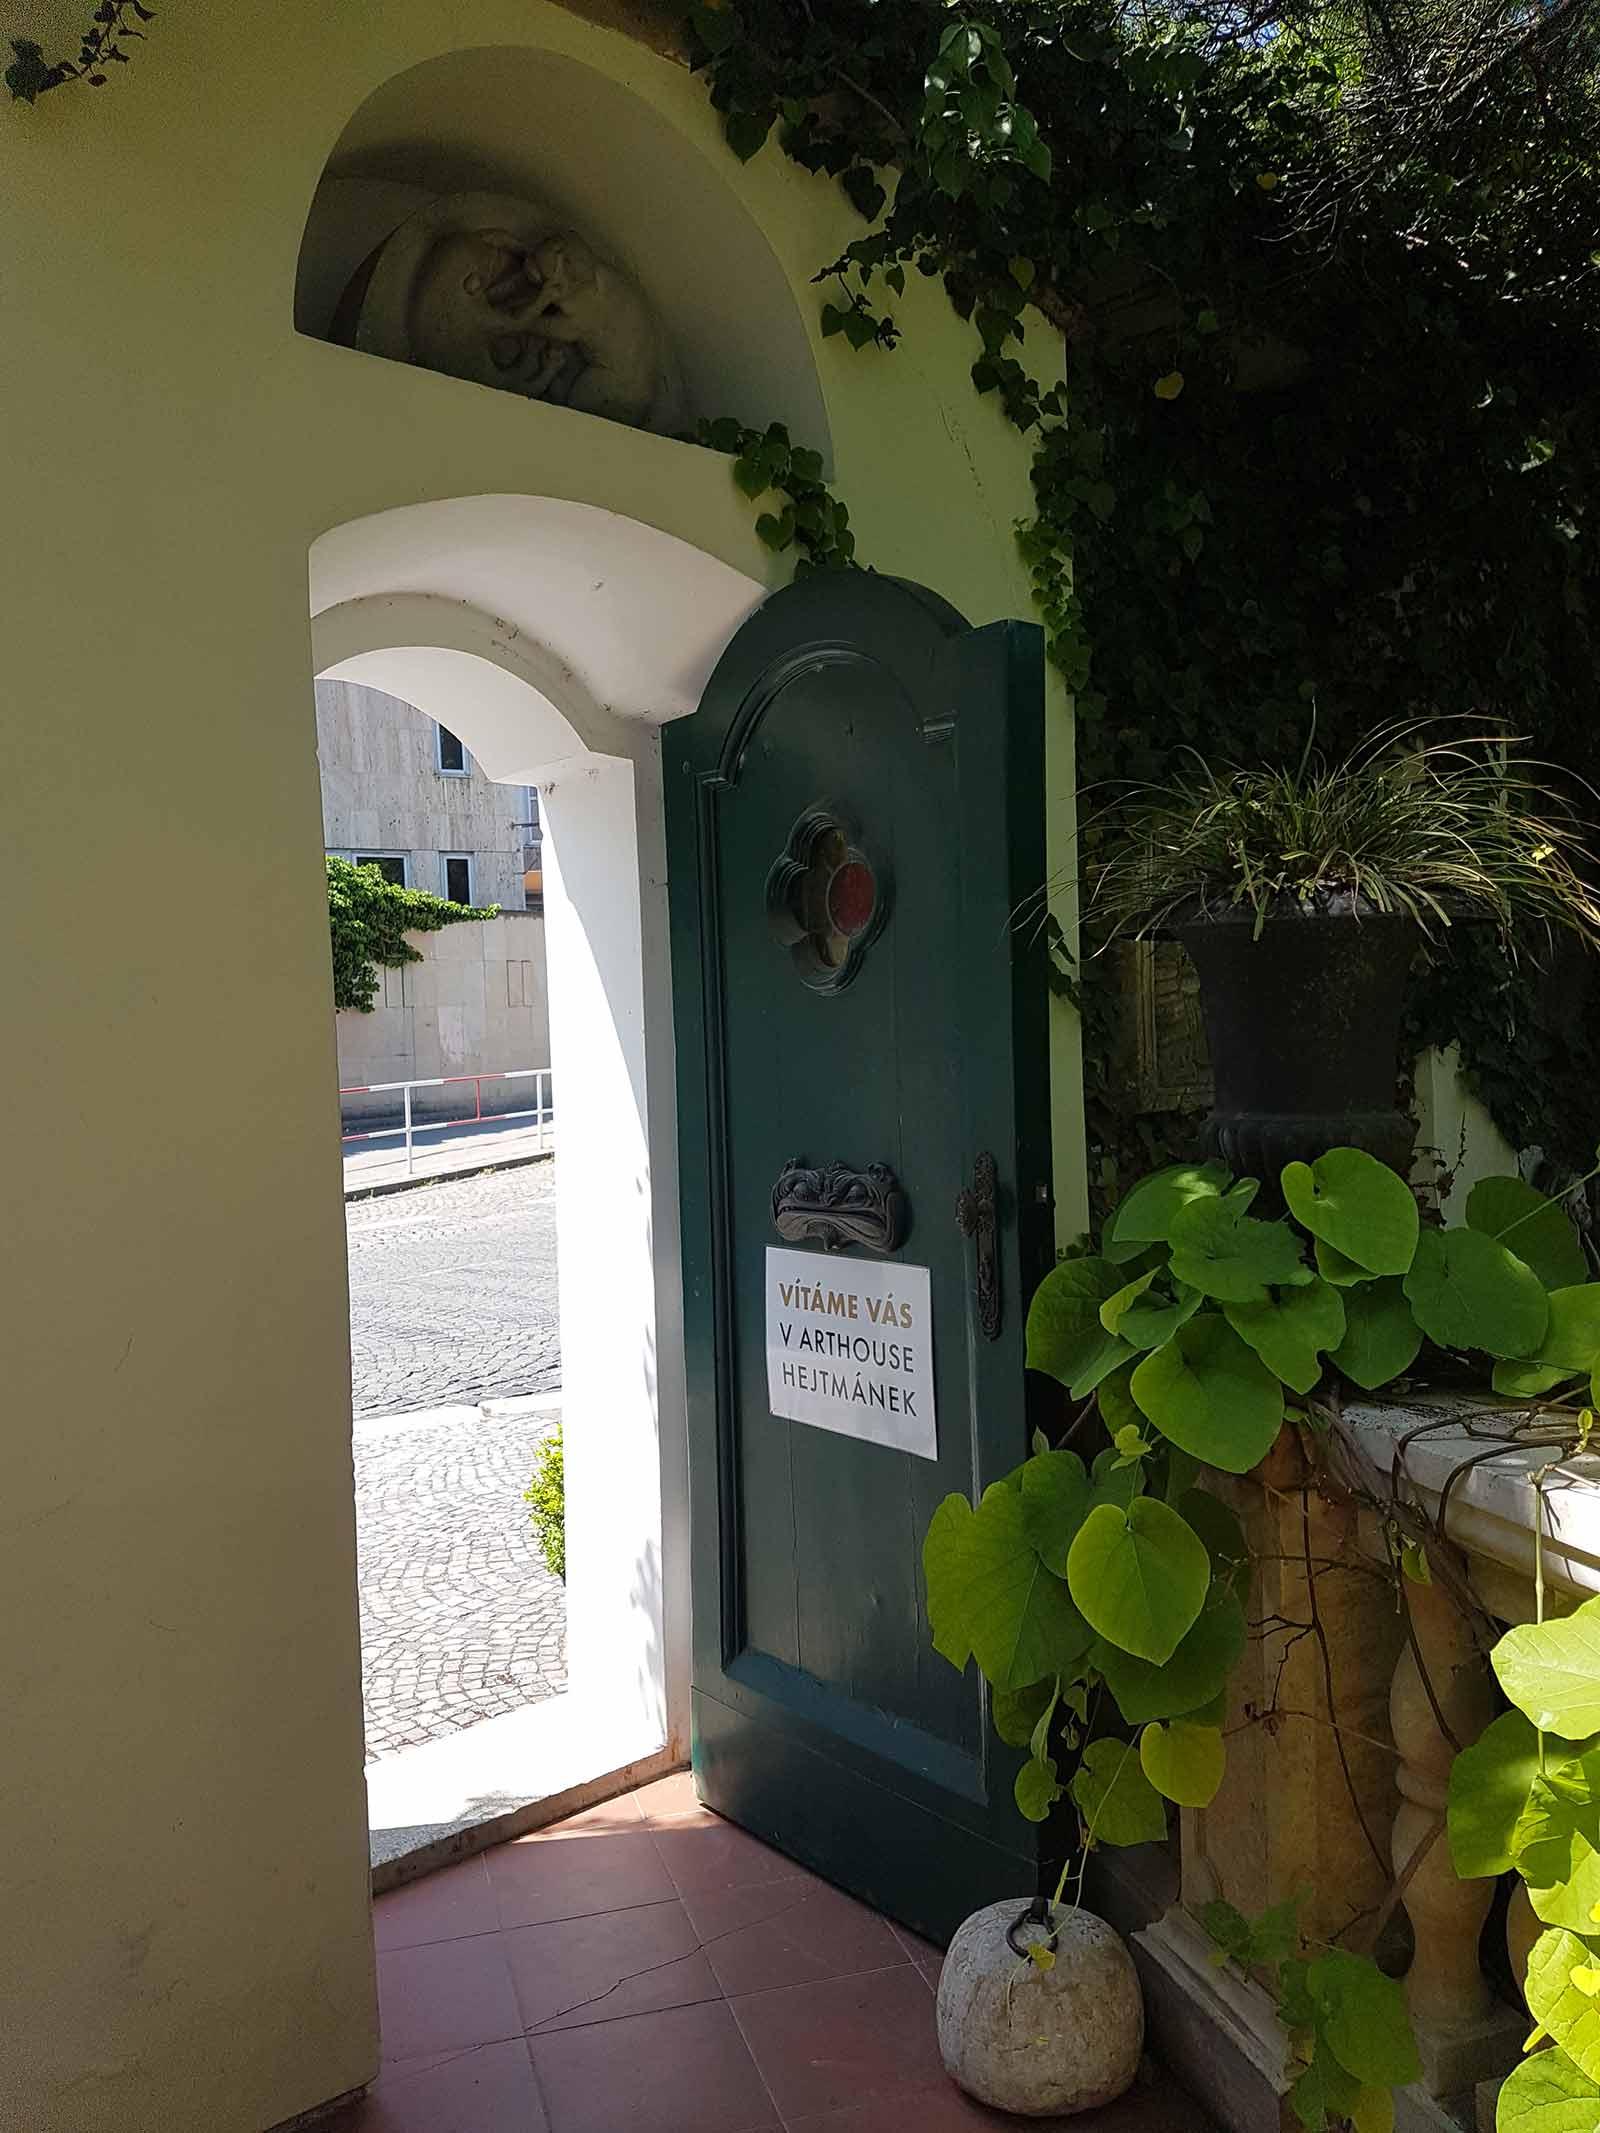 arthouse-zahradni-aukce-005